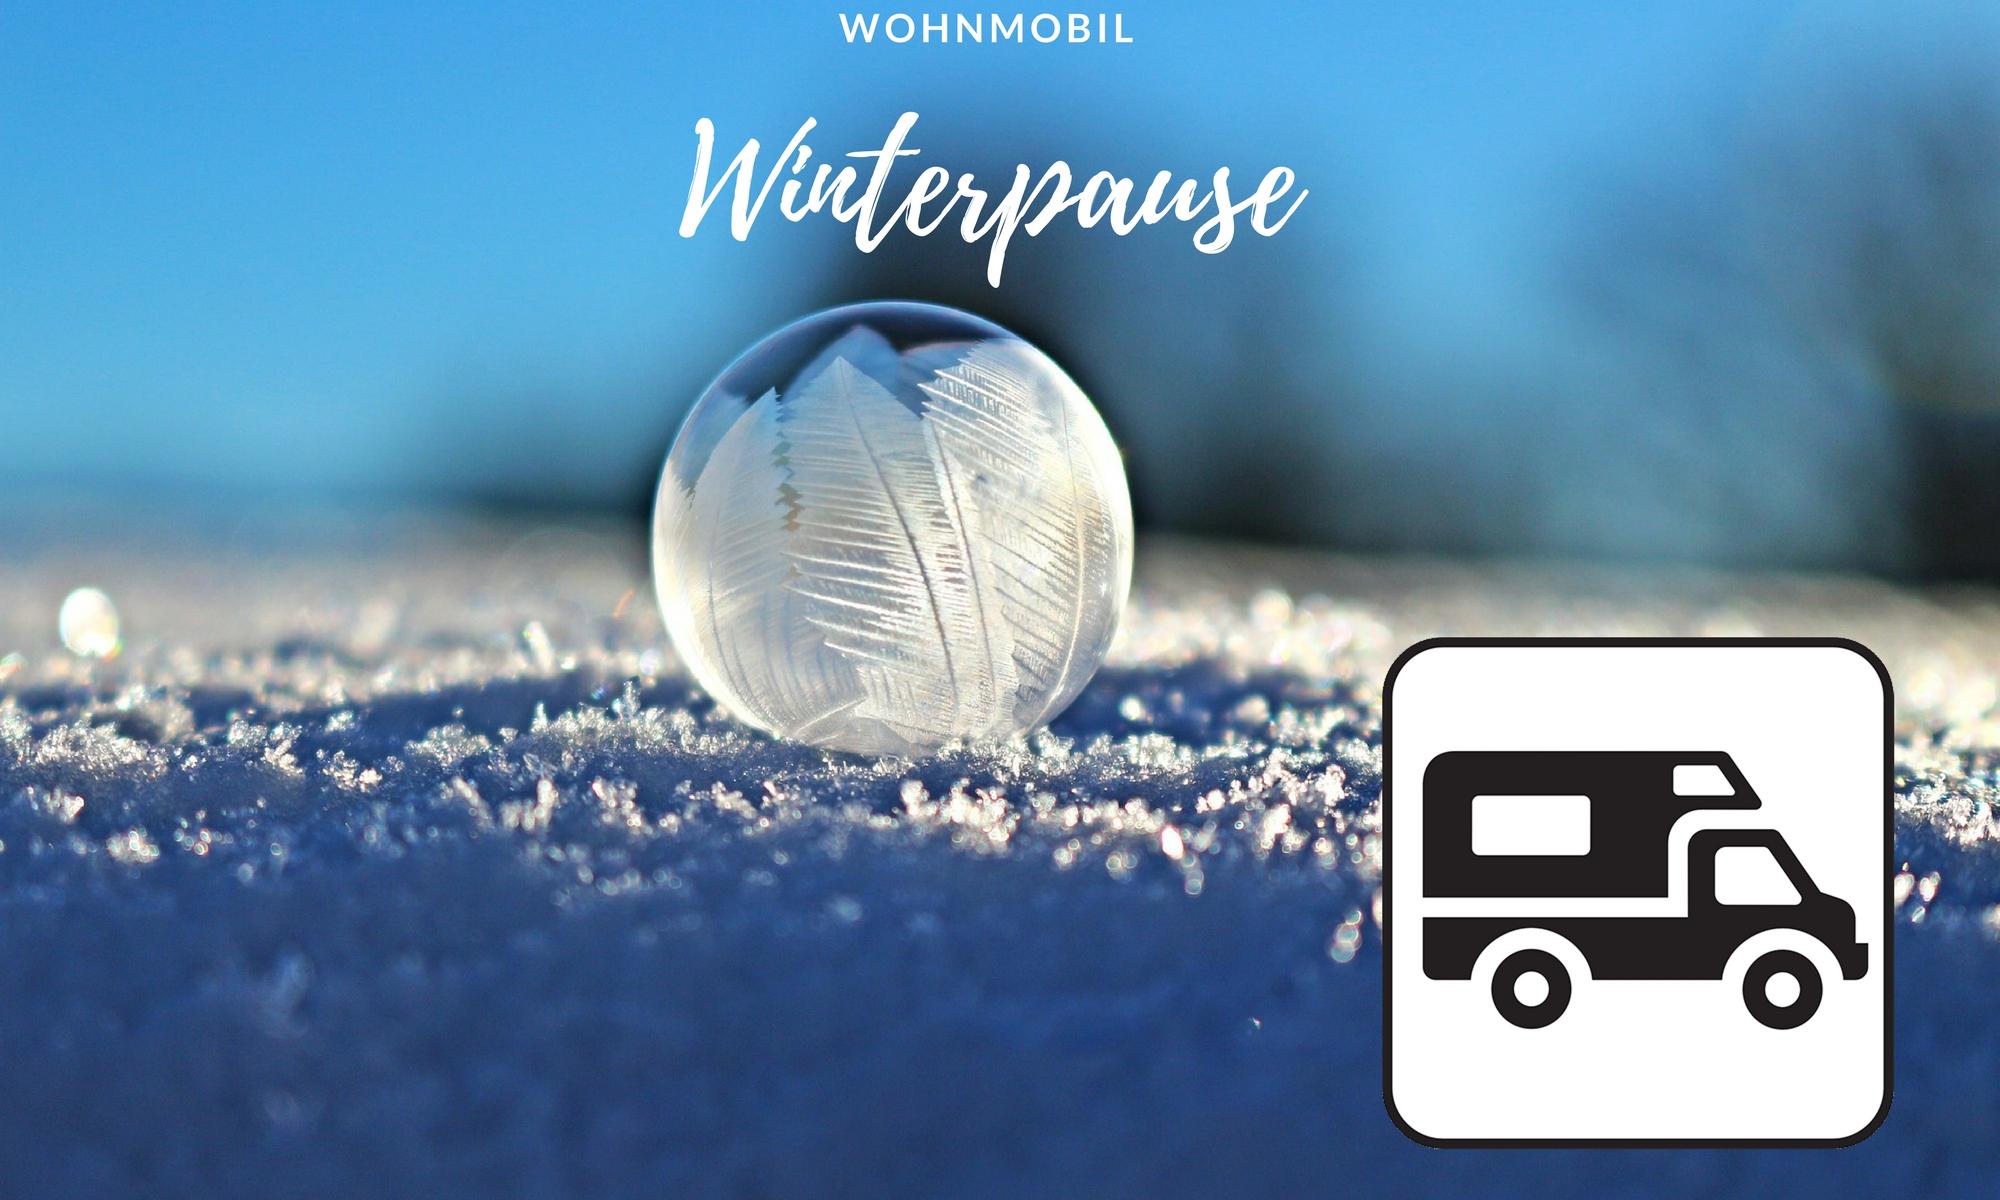 Wintercamping Wohnmobil Winterpause_1